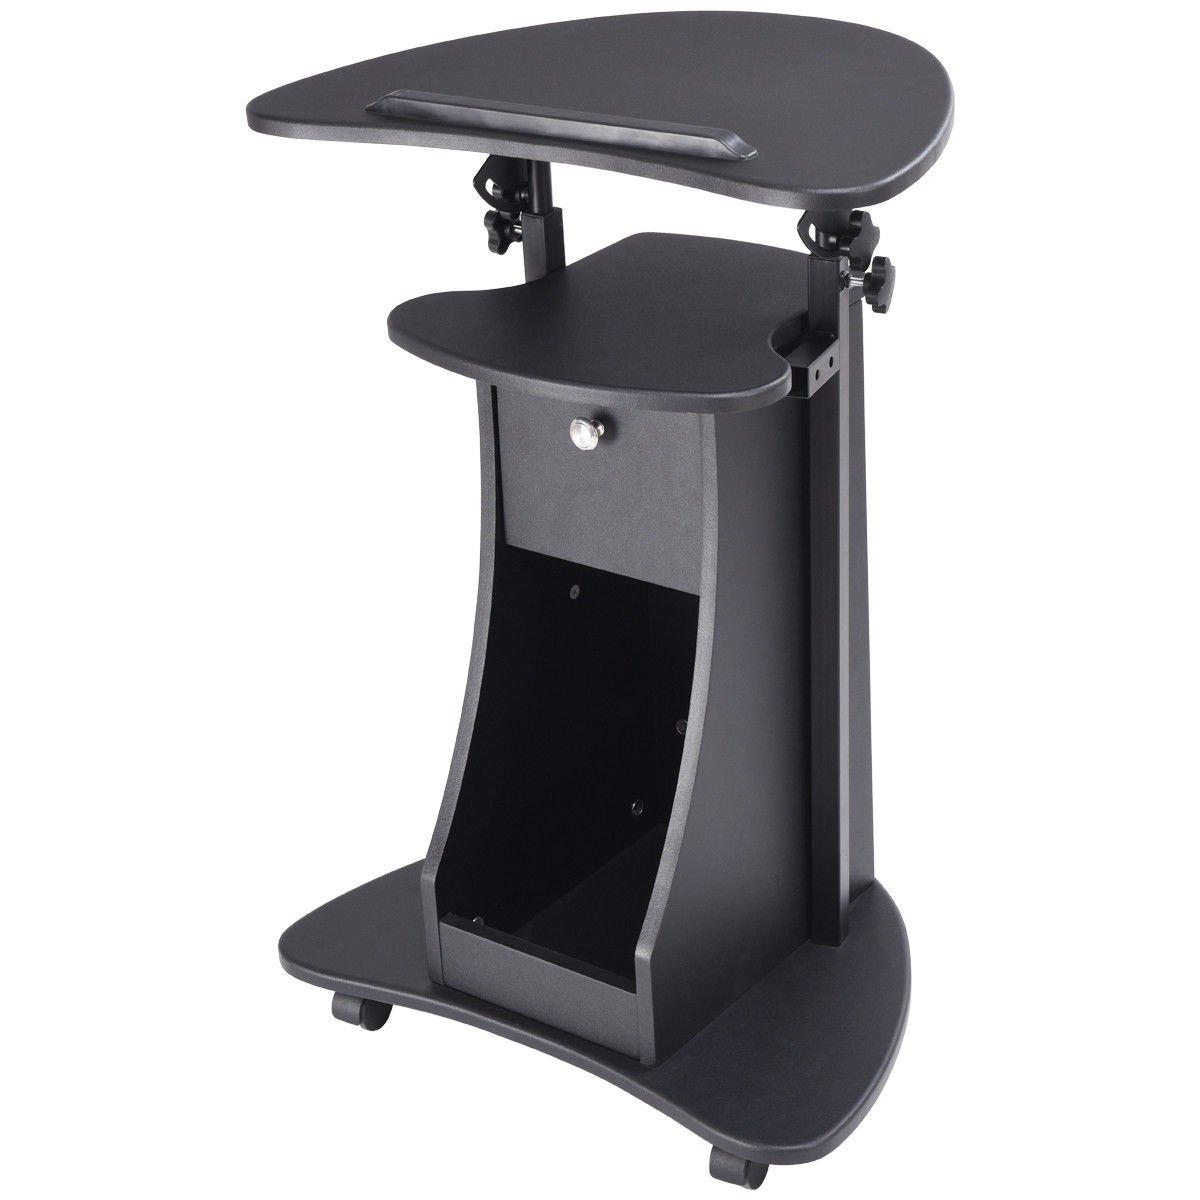 Black Rolling Laptop Cart Stand Up Desk Storage w/ Adjustable Height 32'' - 46'' by FDInspiration